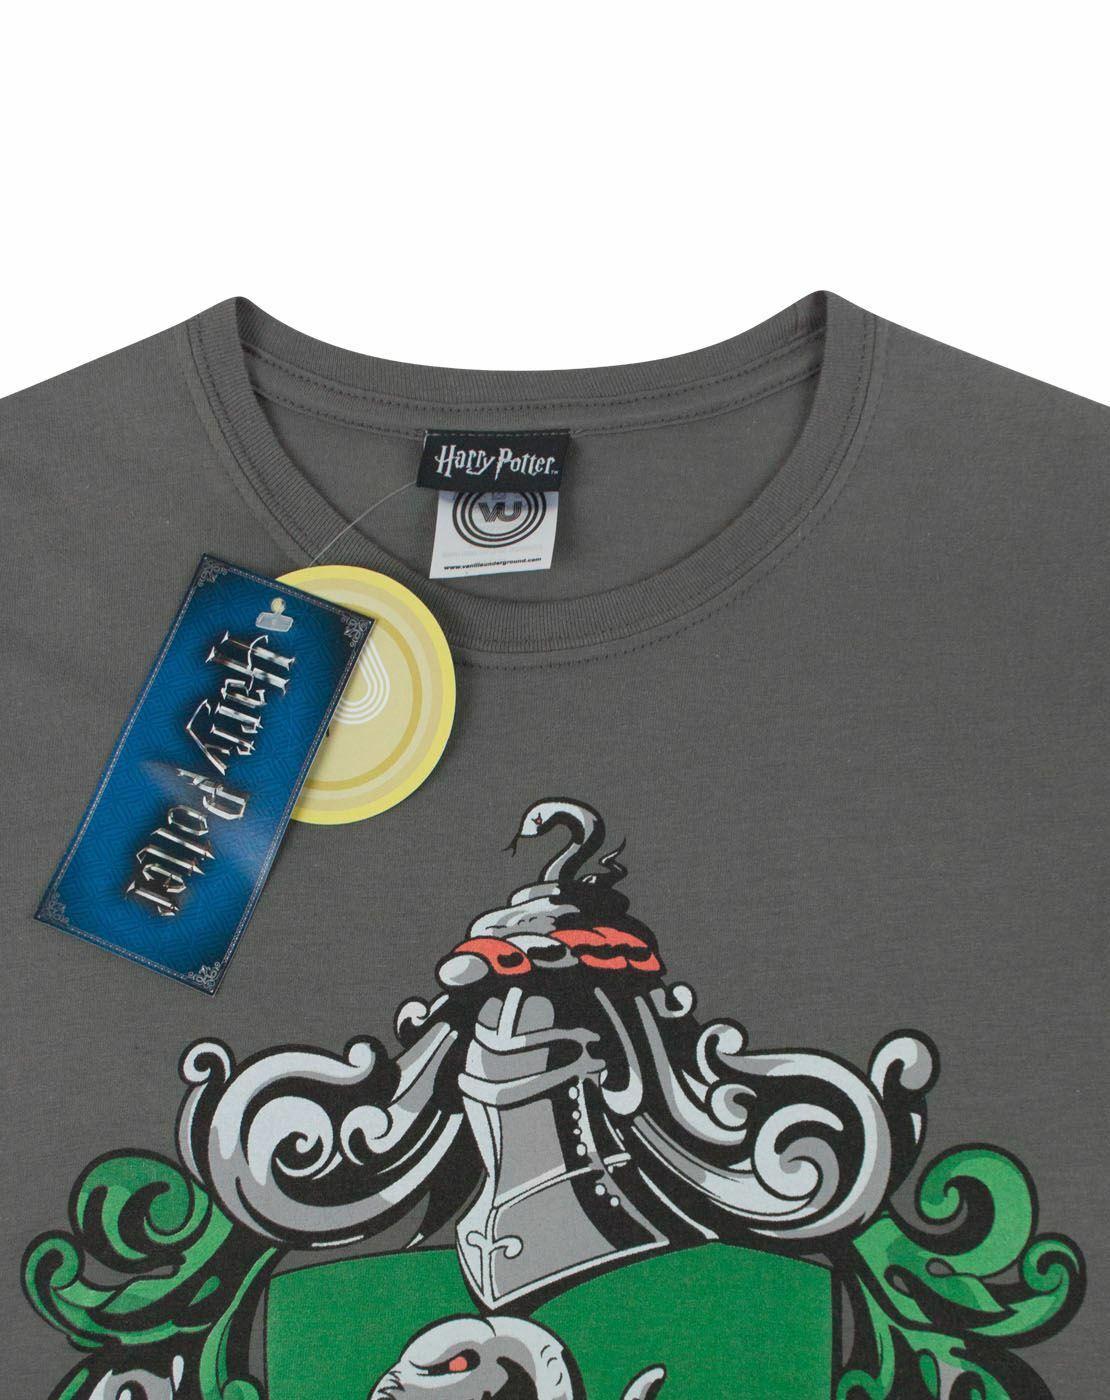 Harry-Potter-Slytherin-Crest-Women-039-s-T-Shirt-and-Mug-Gift-Set-Bundle thumbnail 11